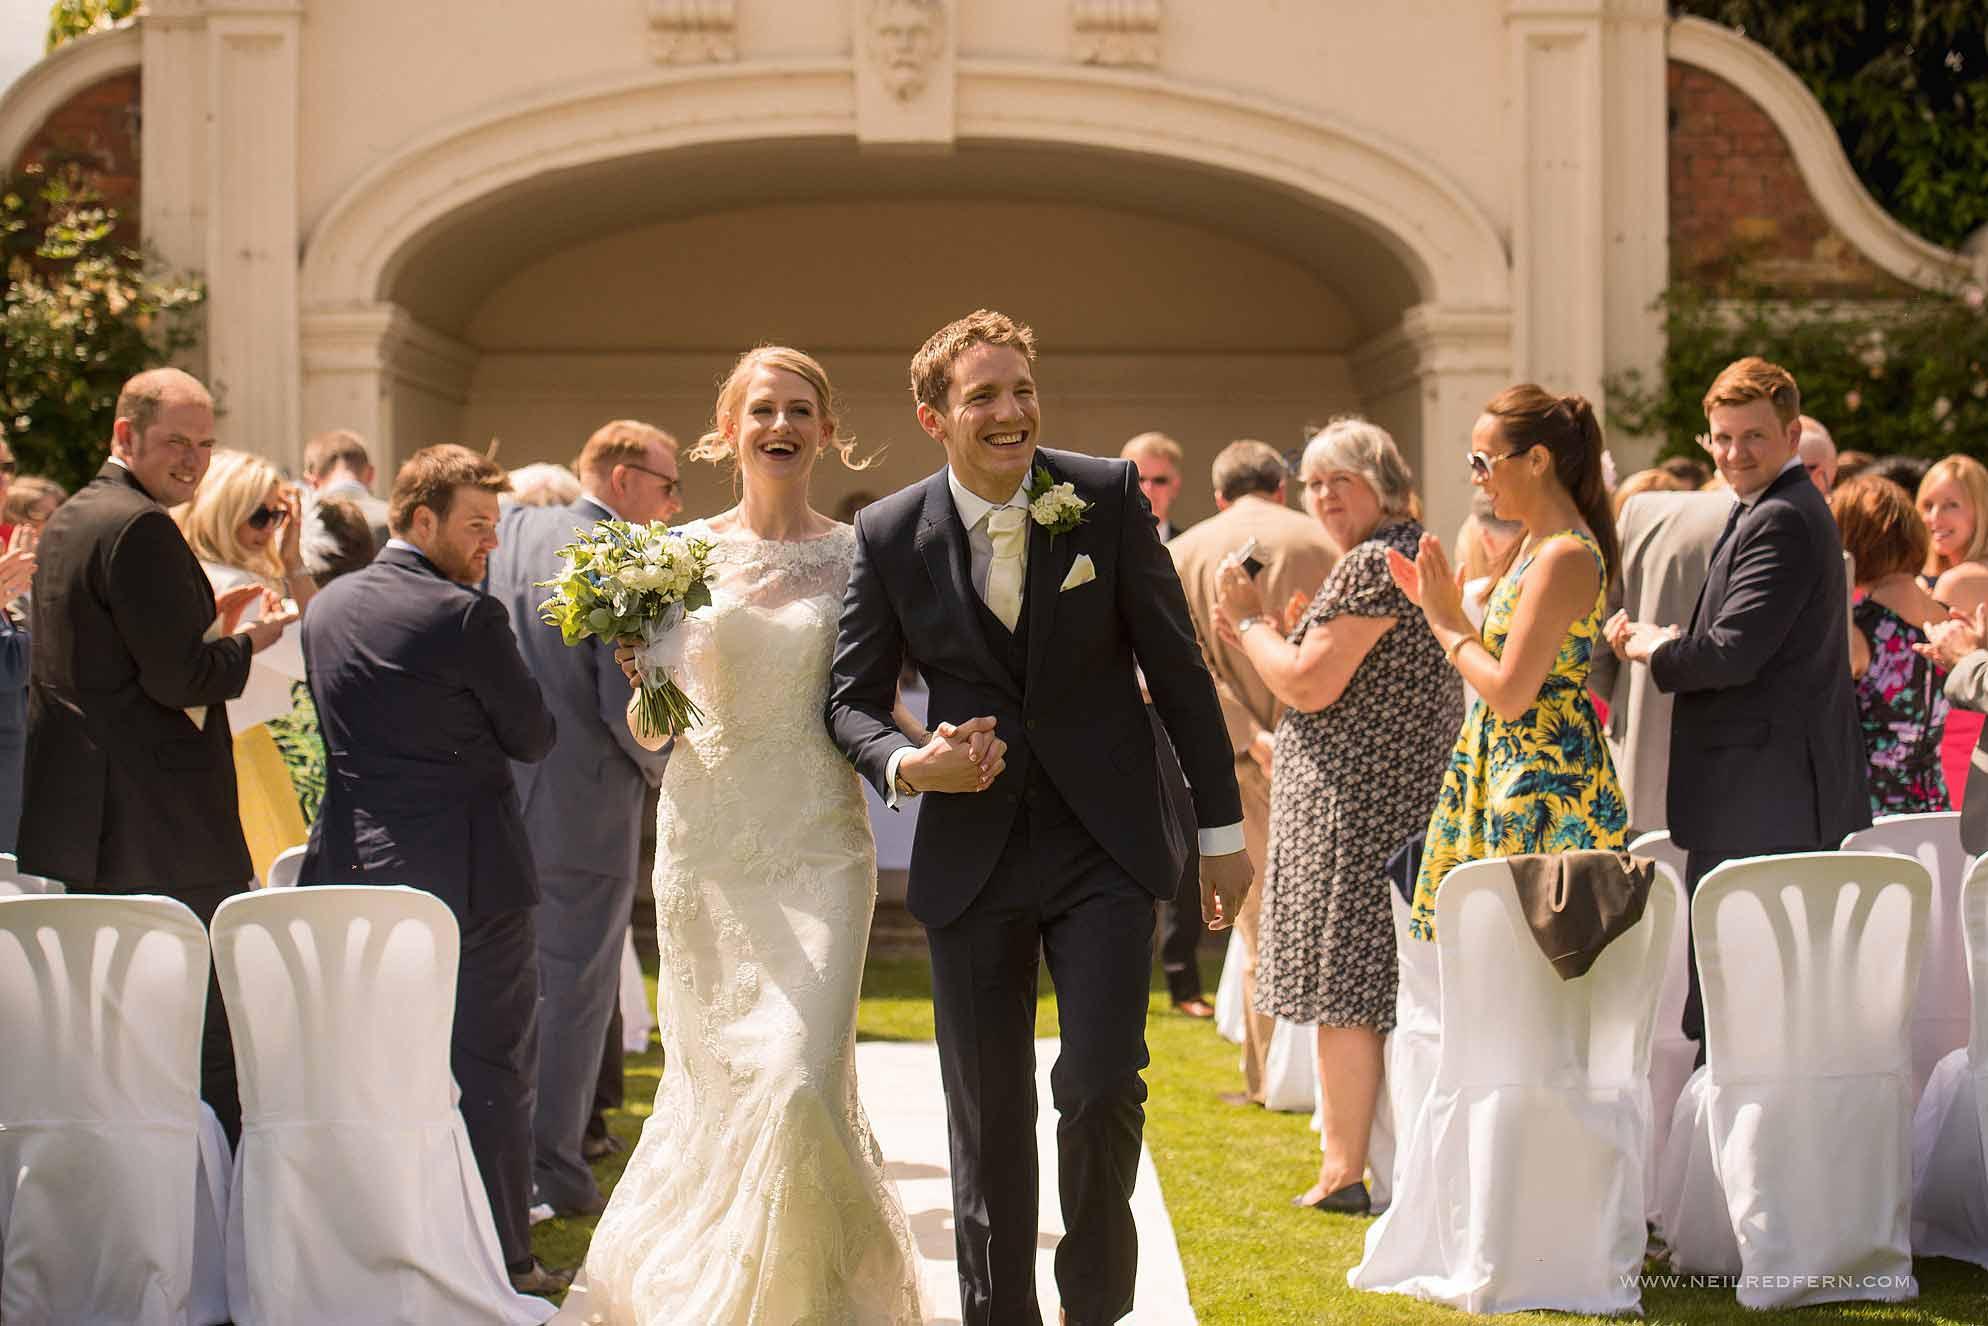 outdoor-wedding-ceremony-in-cheshire-7